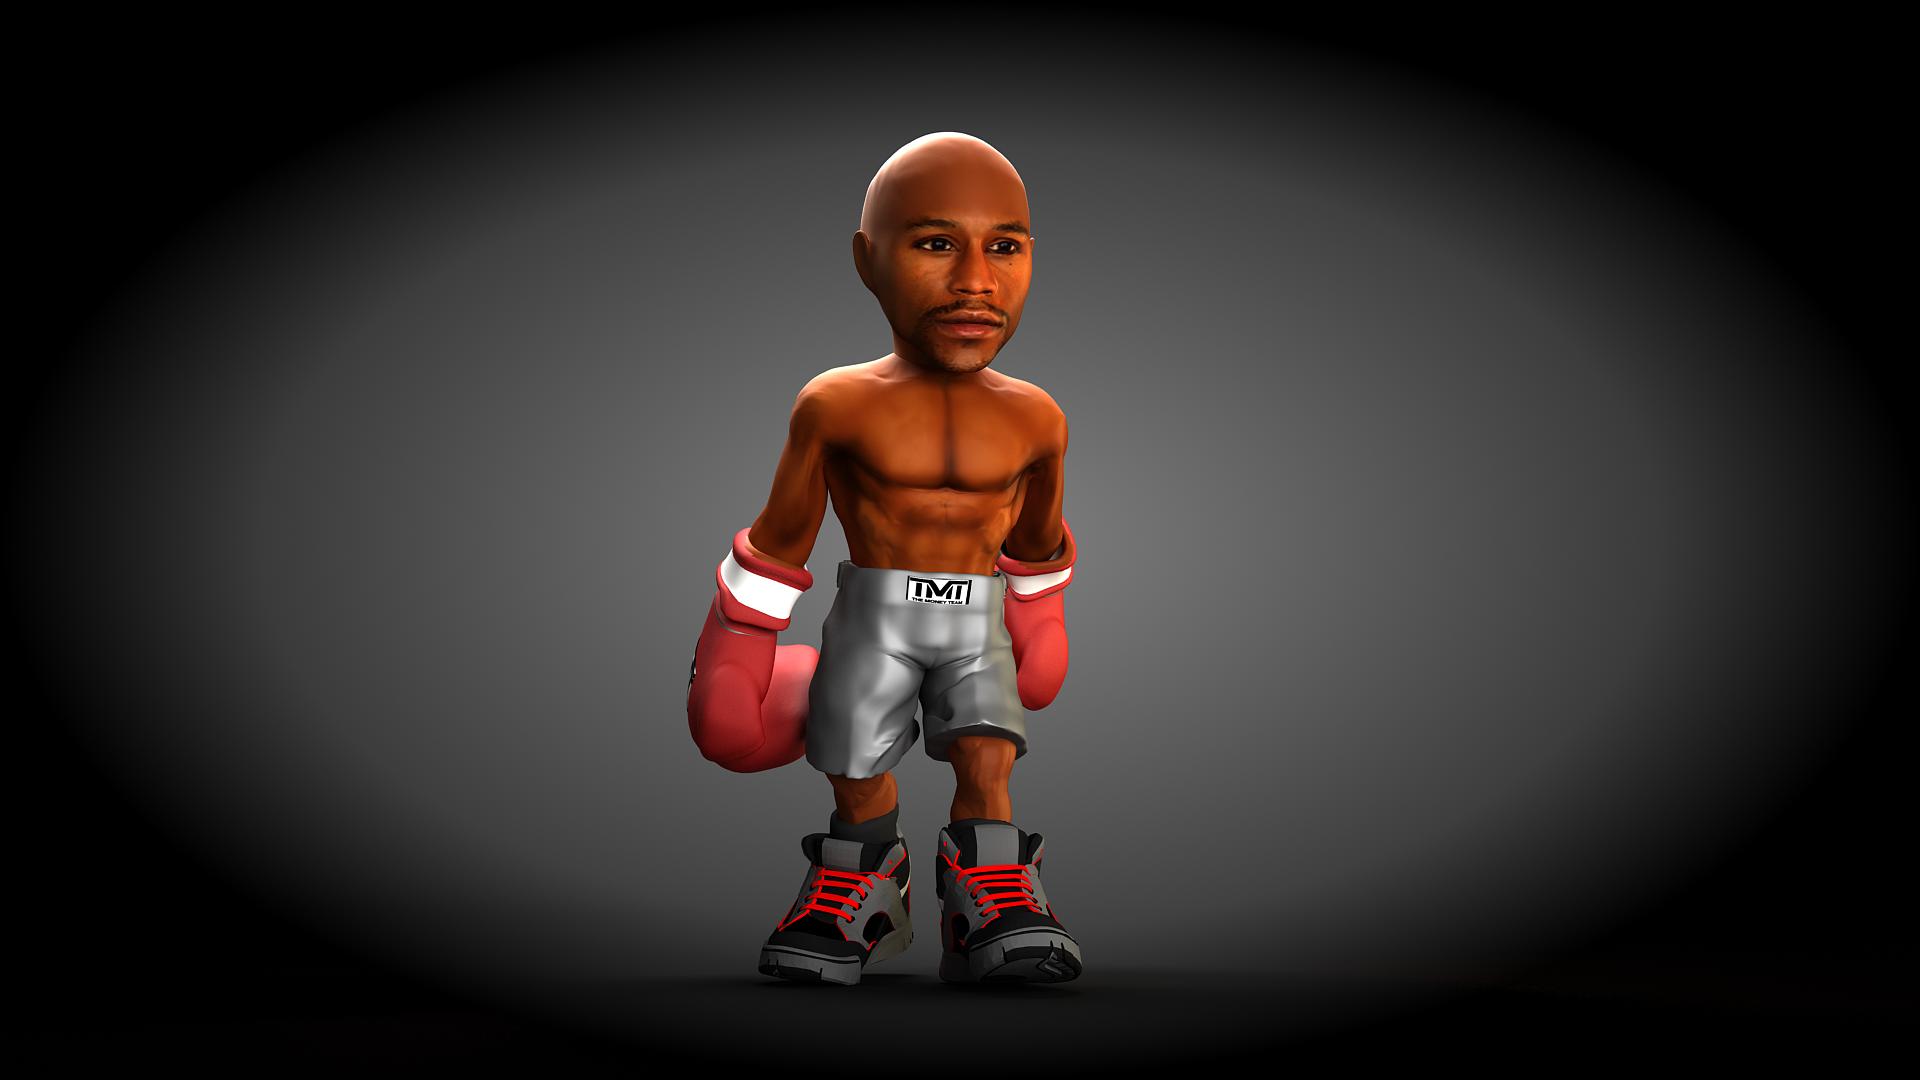 Floyd Mayweather Jr PNG Image